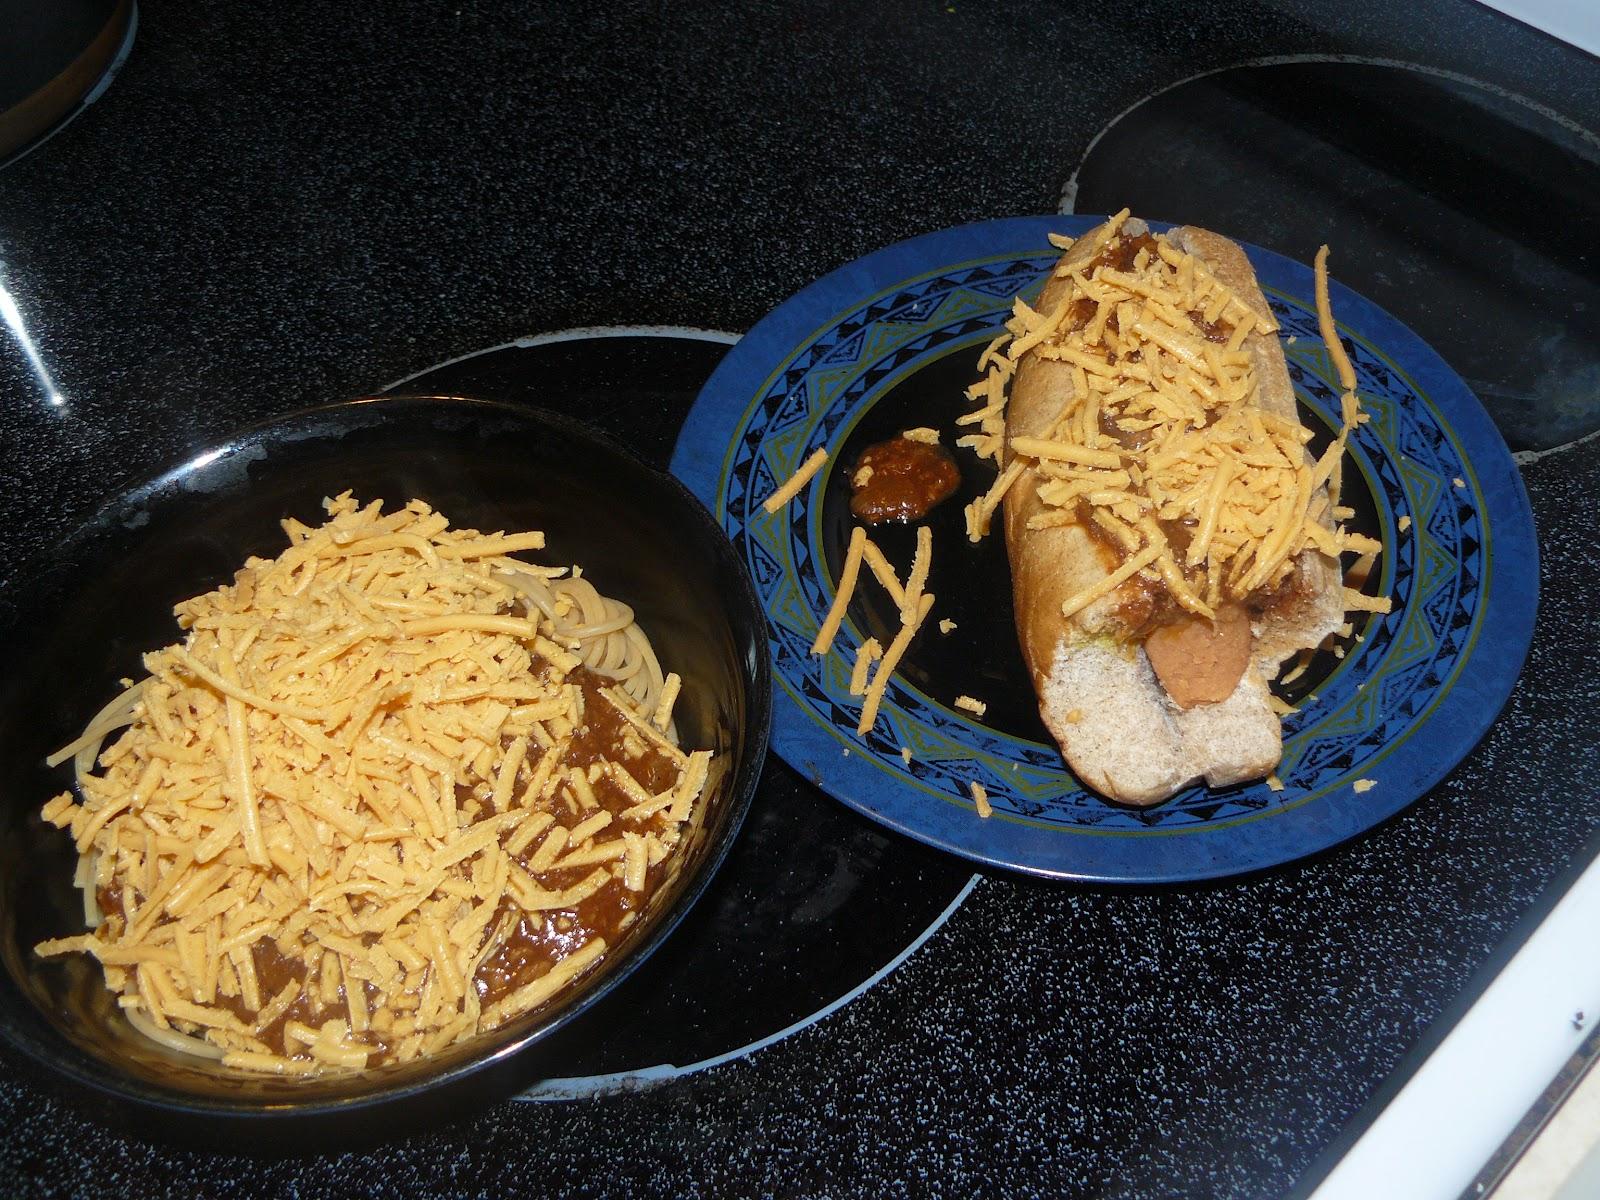 SUPER Vegan Cincinnati Chili, Chili 'Cheese' Dip & Coneys!